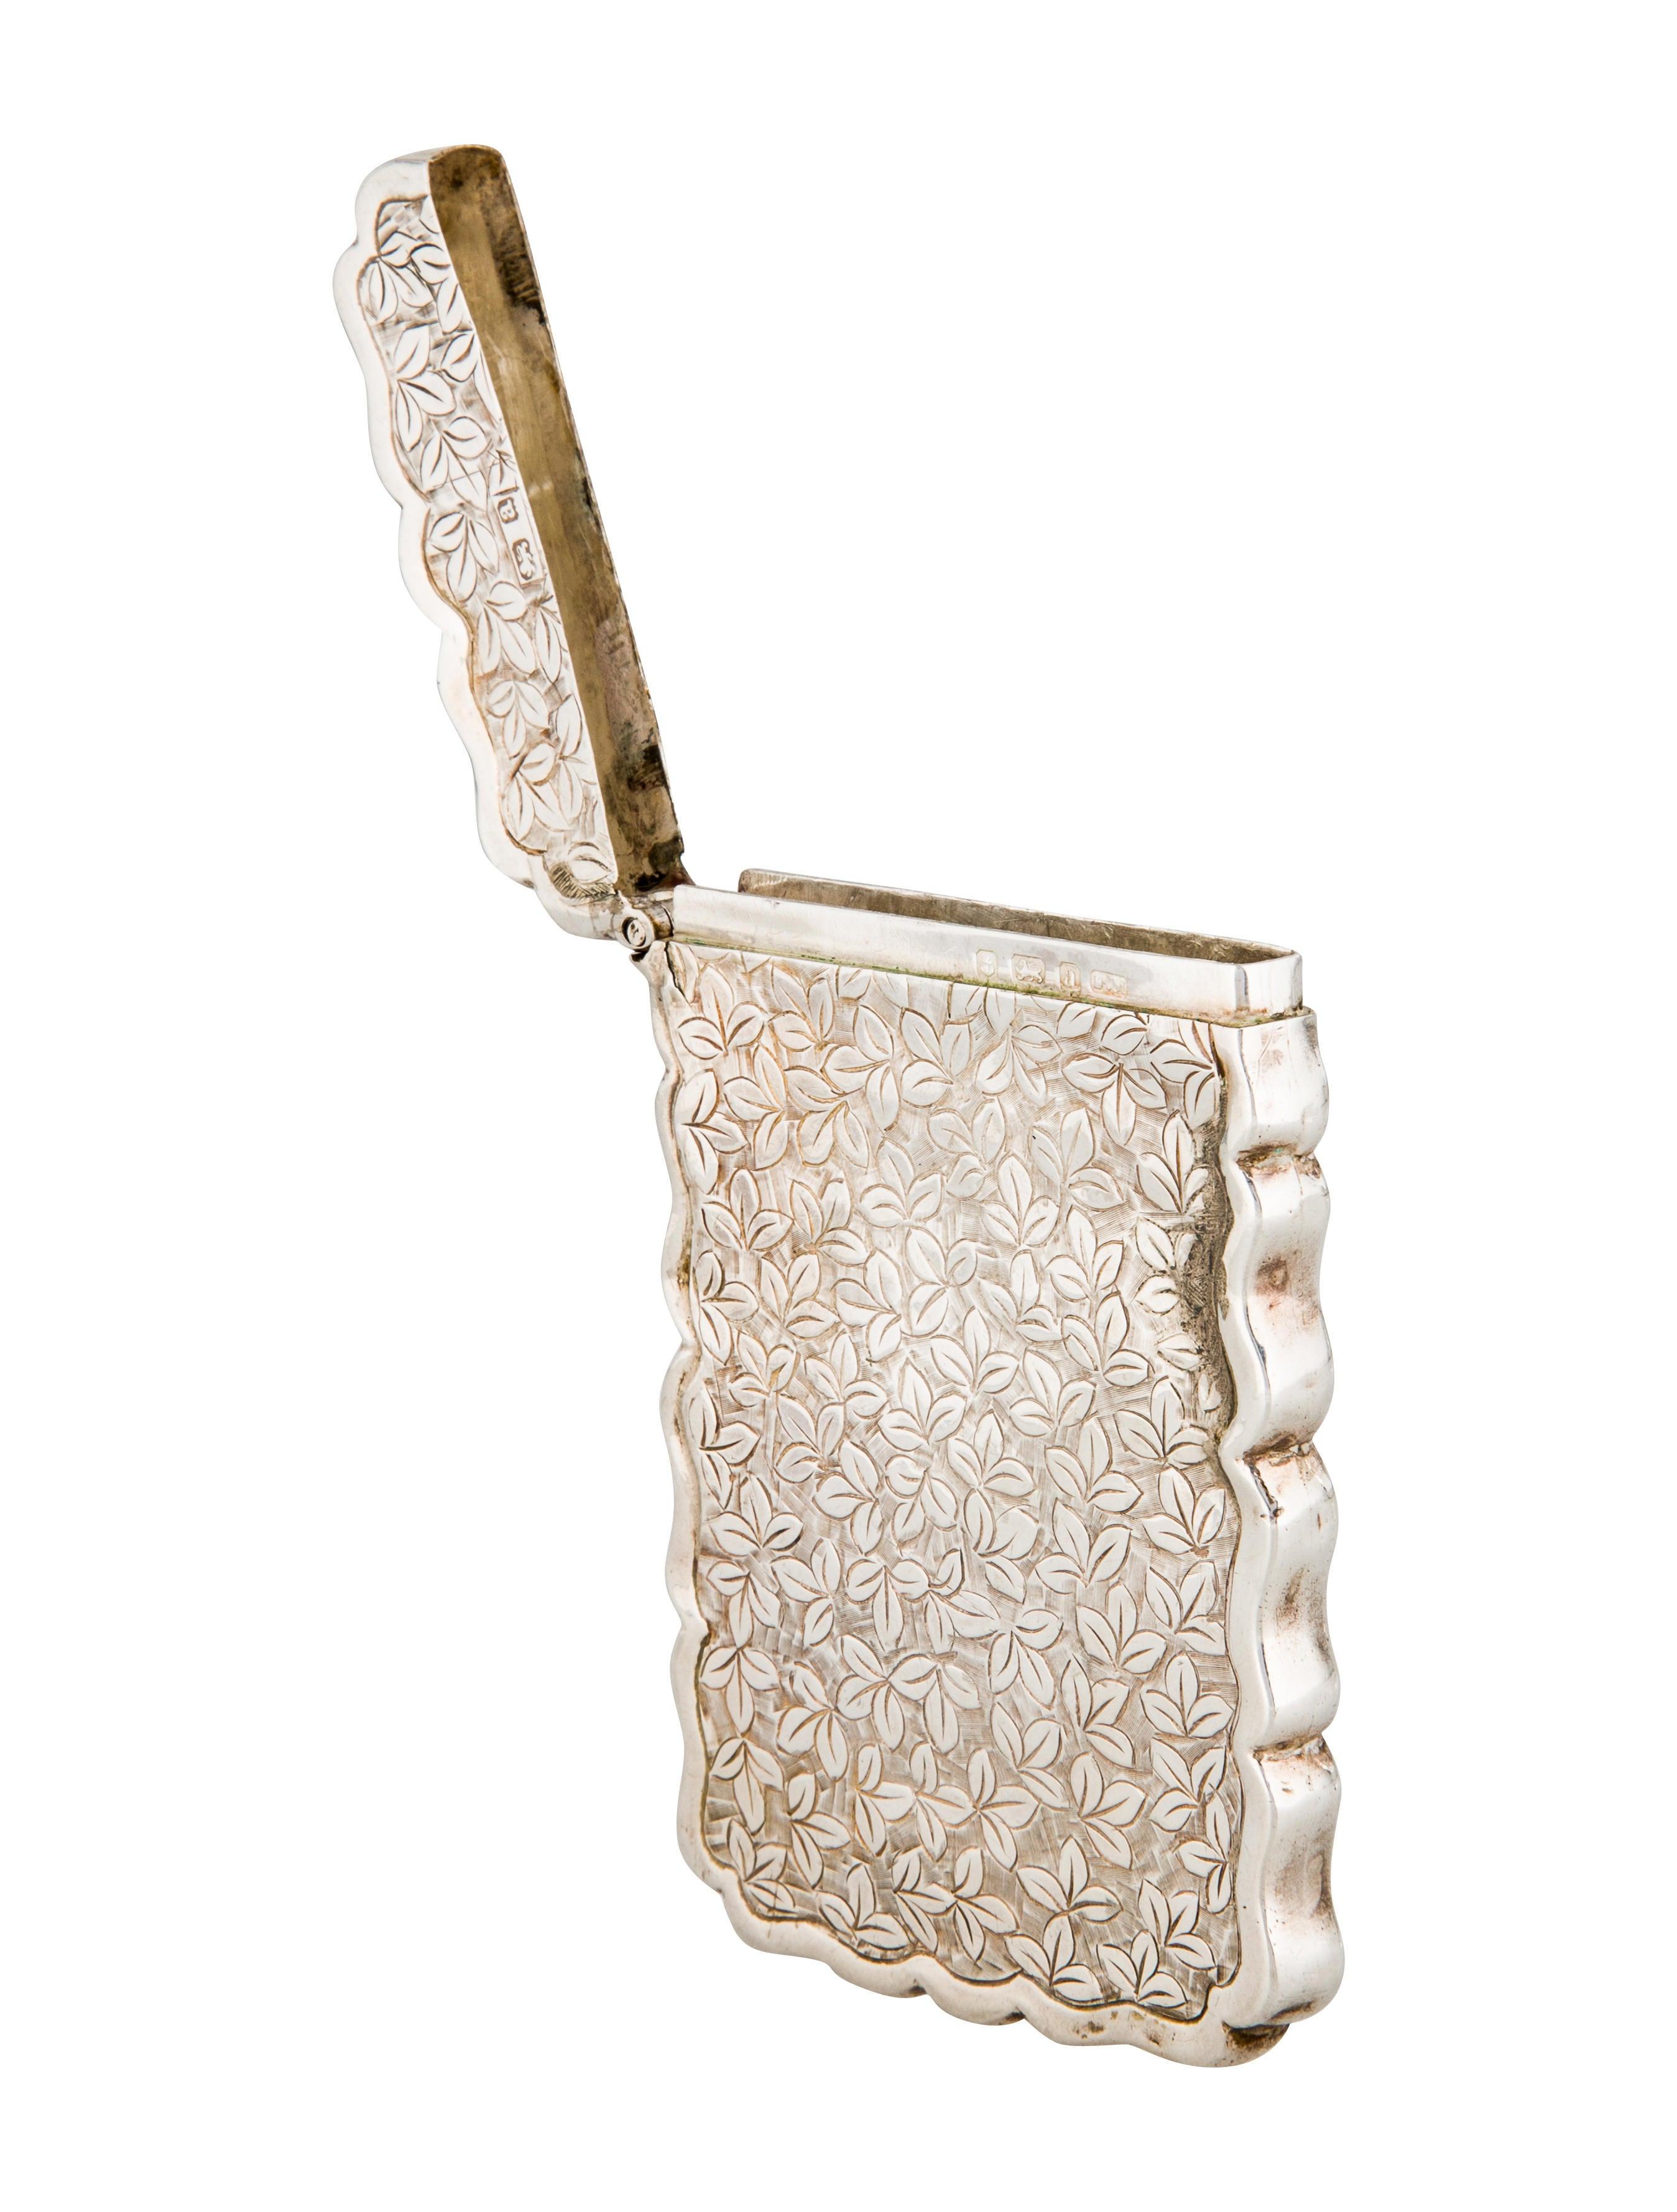 Sterling silver frederick marson antique card case decor for Artistic accents genuine silver decoration